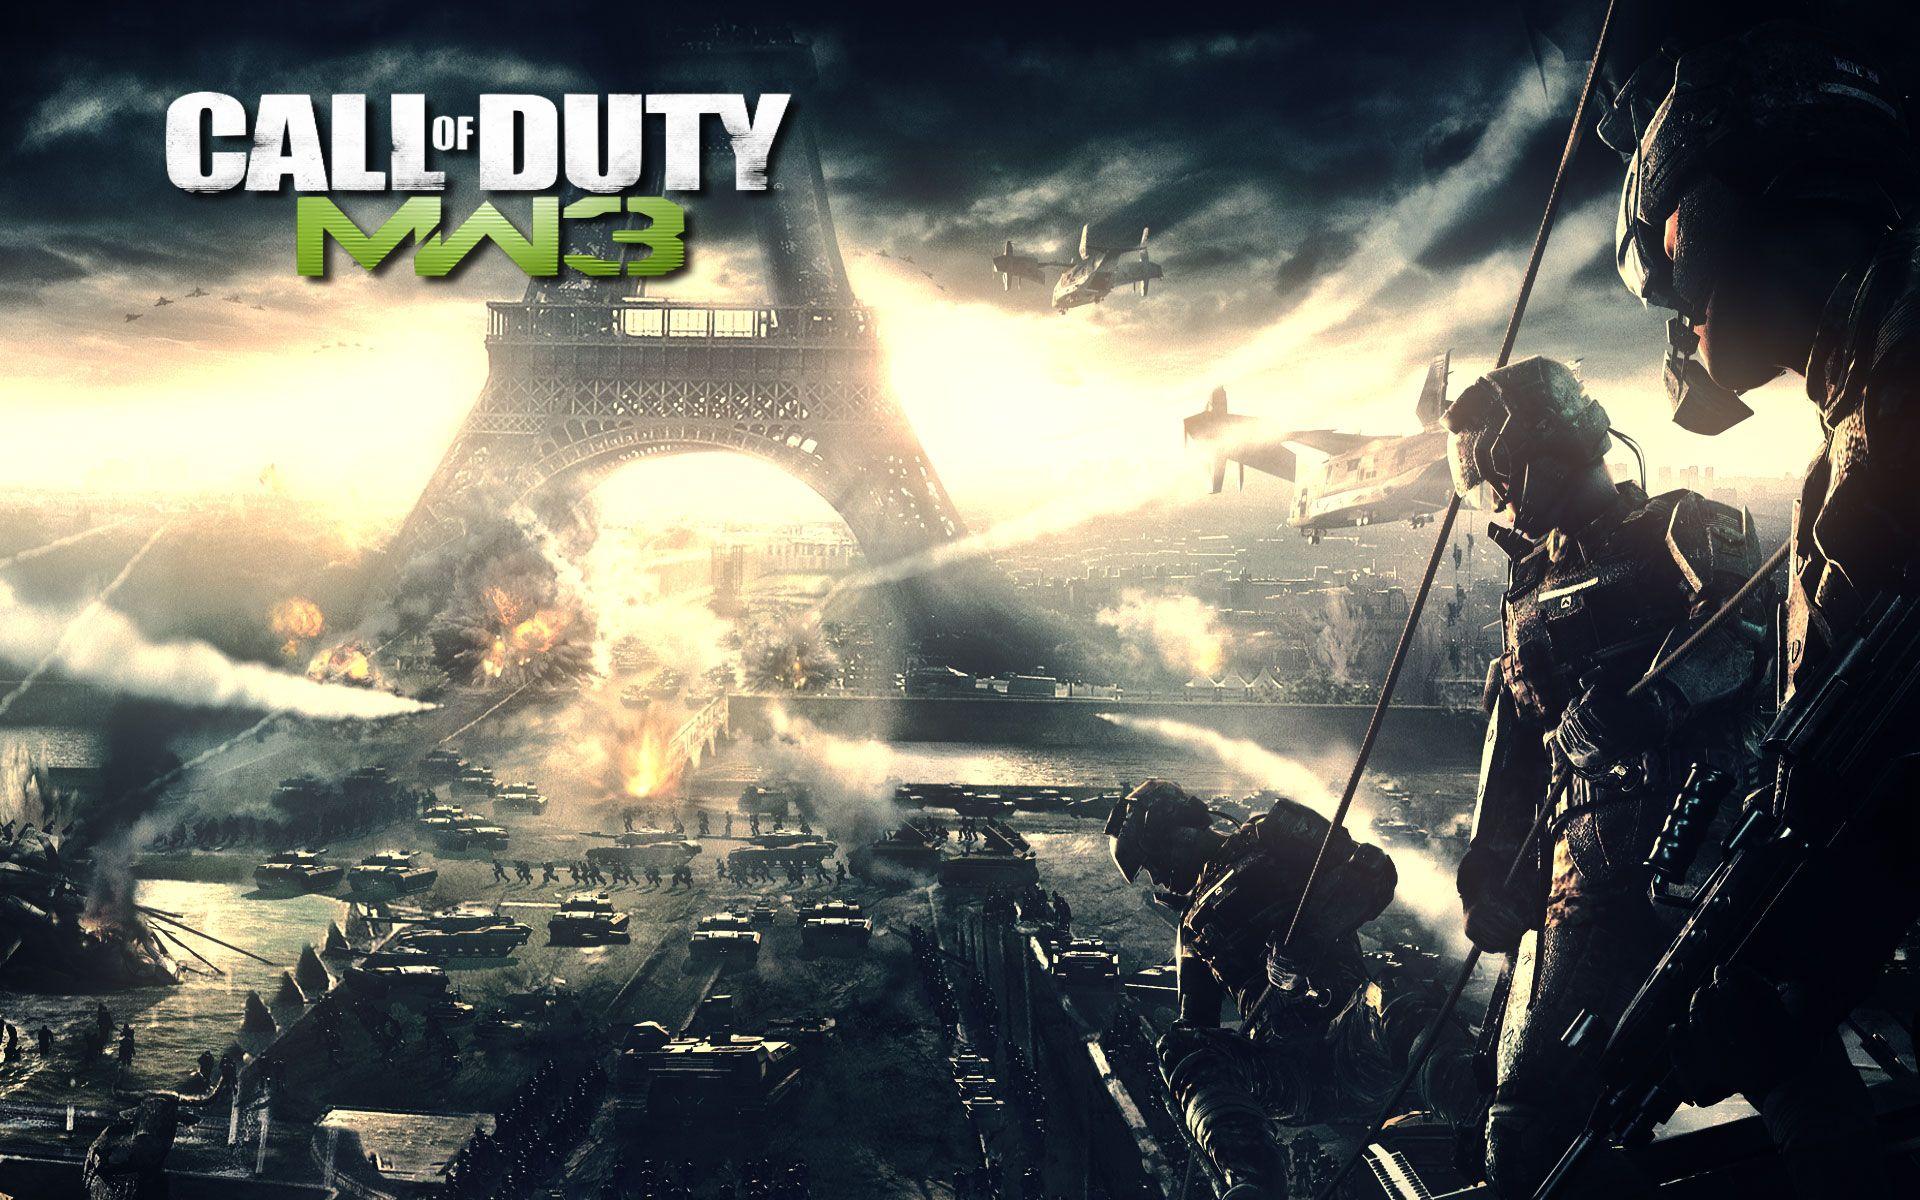 22 Call Of Duty Modern Warfare 3 Hd Wallpapers Backgrounds Call Of Duty Modern Warfare Best Games